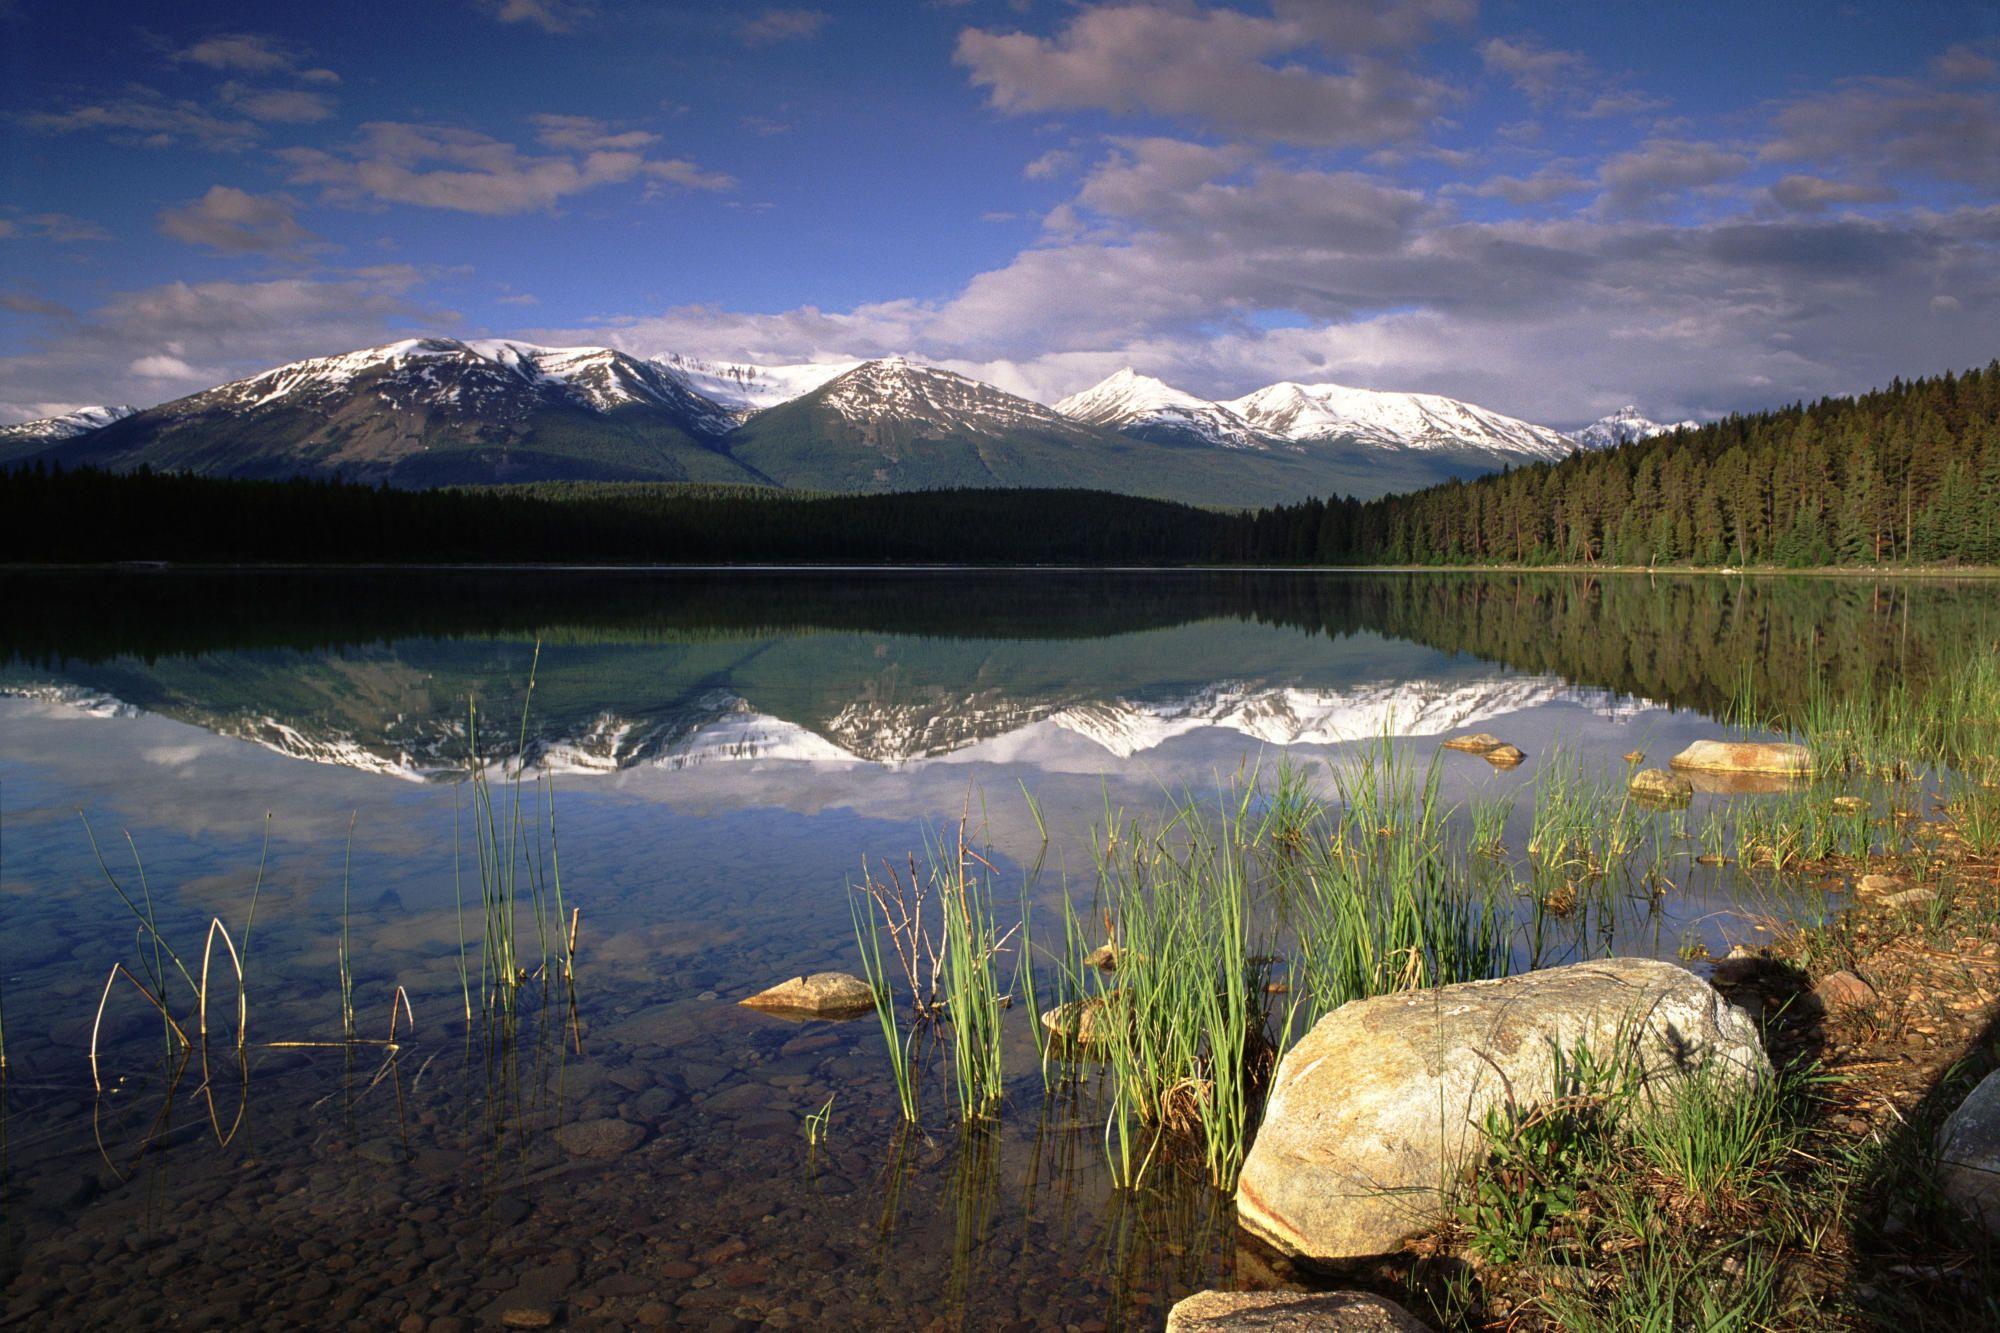 Spirit Island Maligne Lake Jasper National Park Alberta Canada. LIVE IT WITH JUMP! Source Unknown